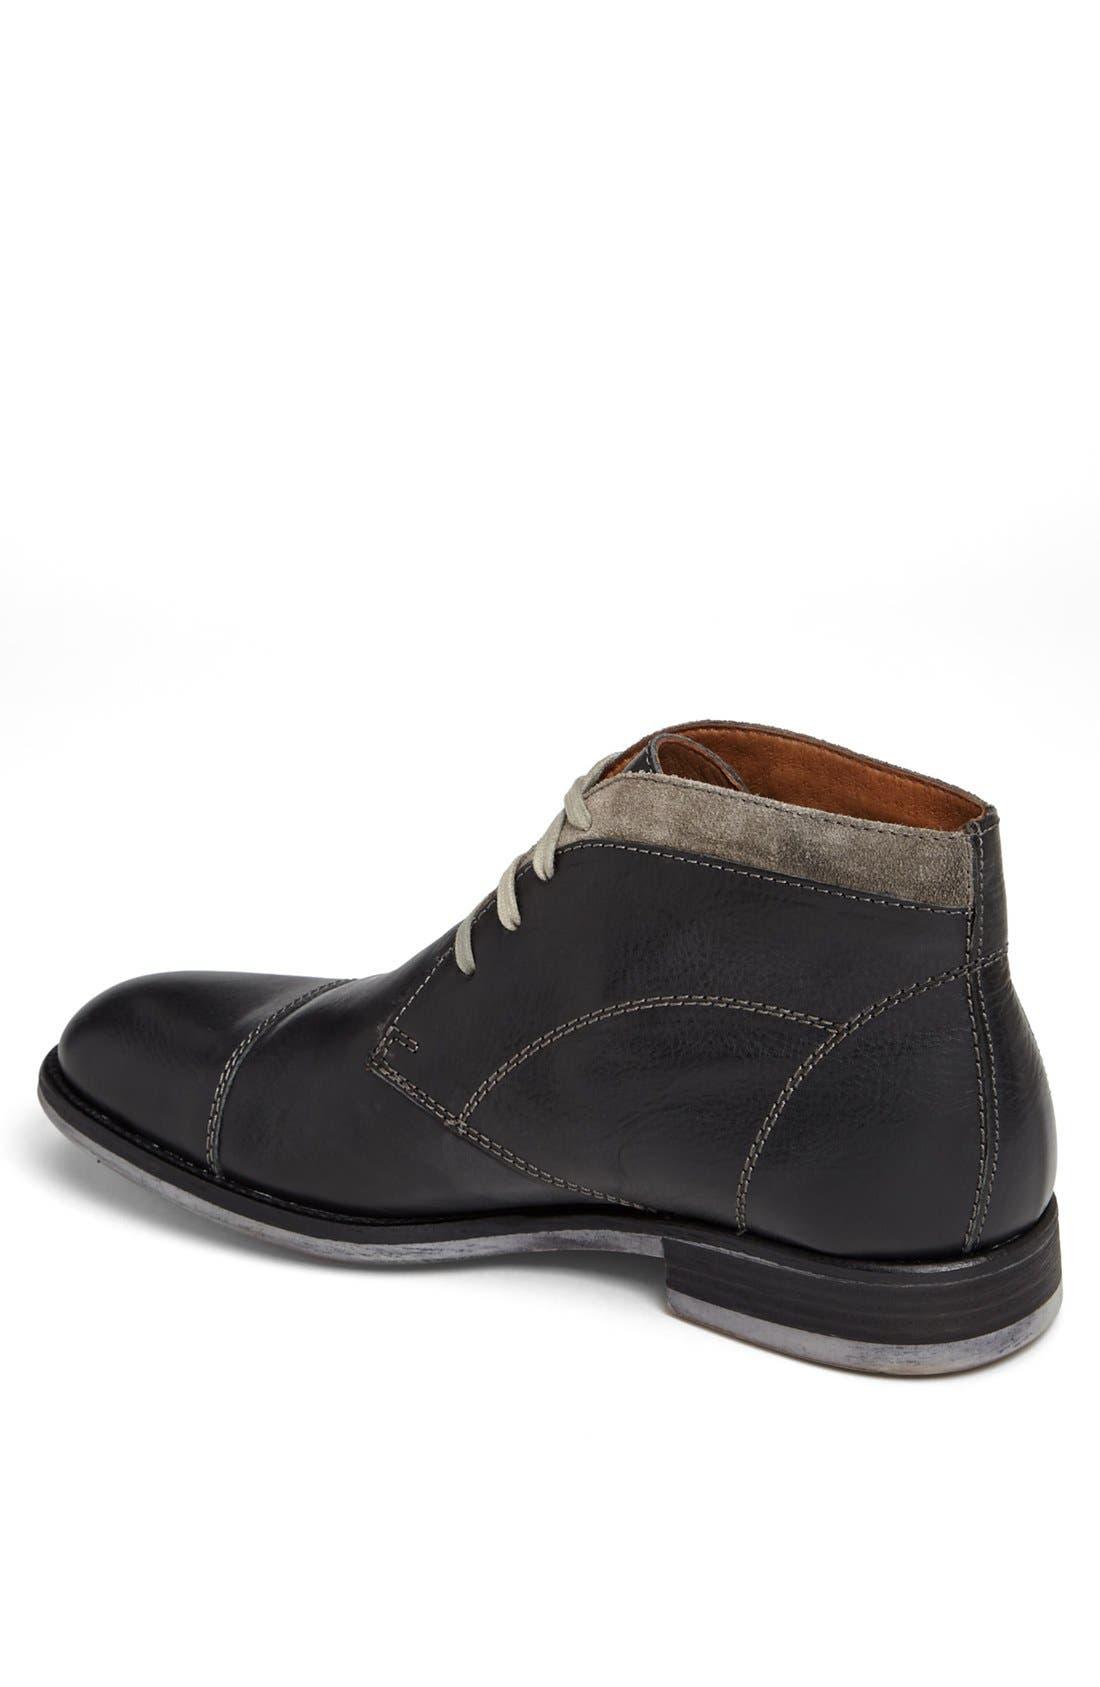 Alternate Image 2  - J&M 1850 'Decatur' Chukka Boot (Men)